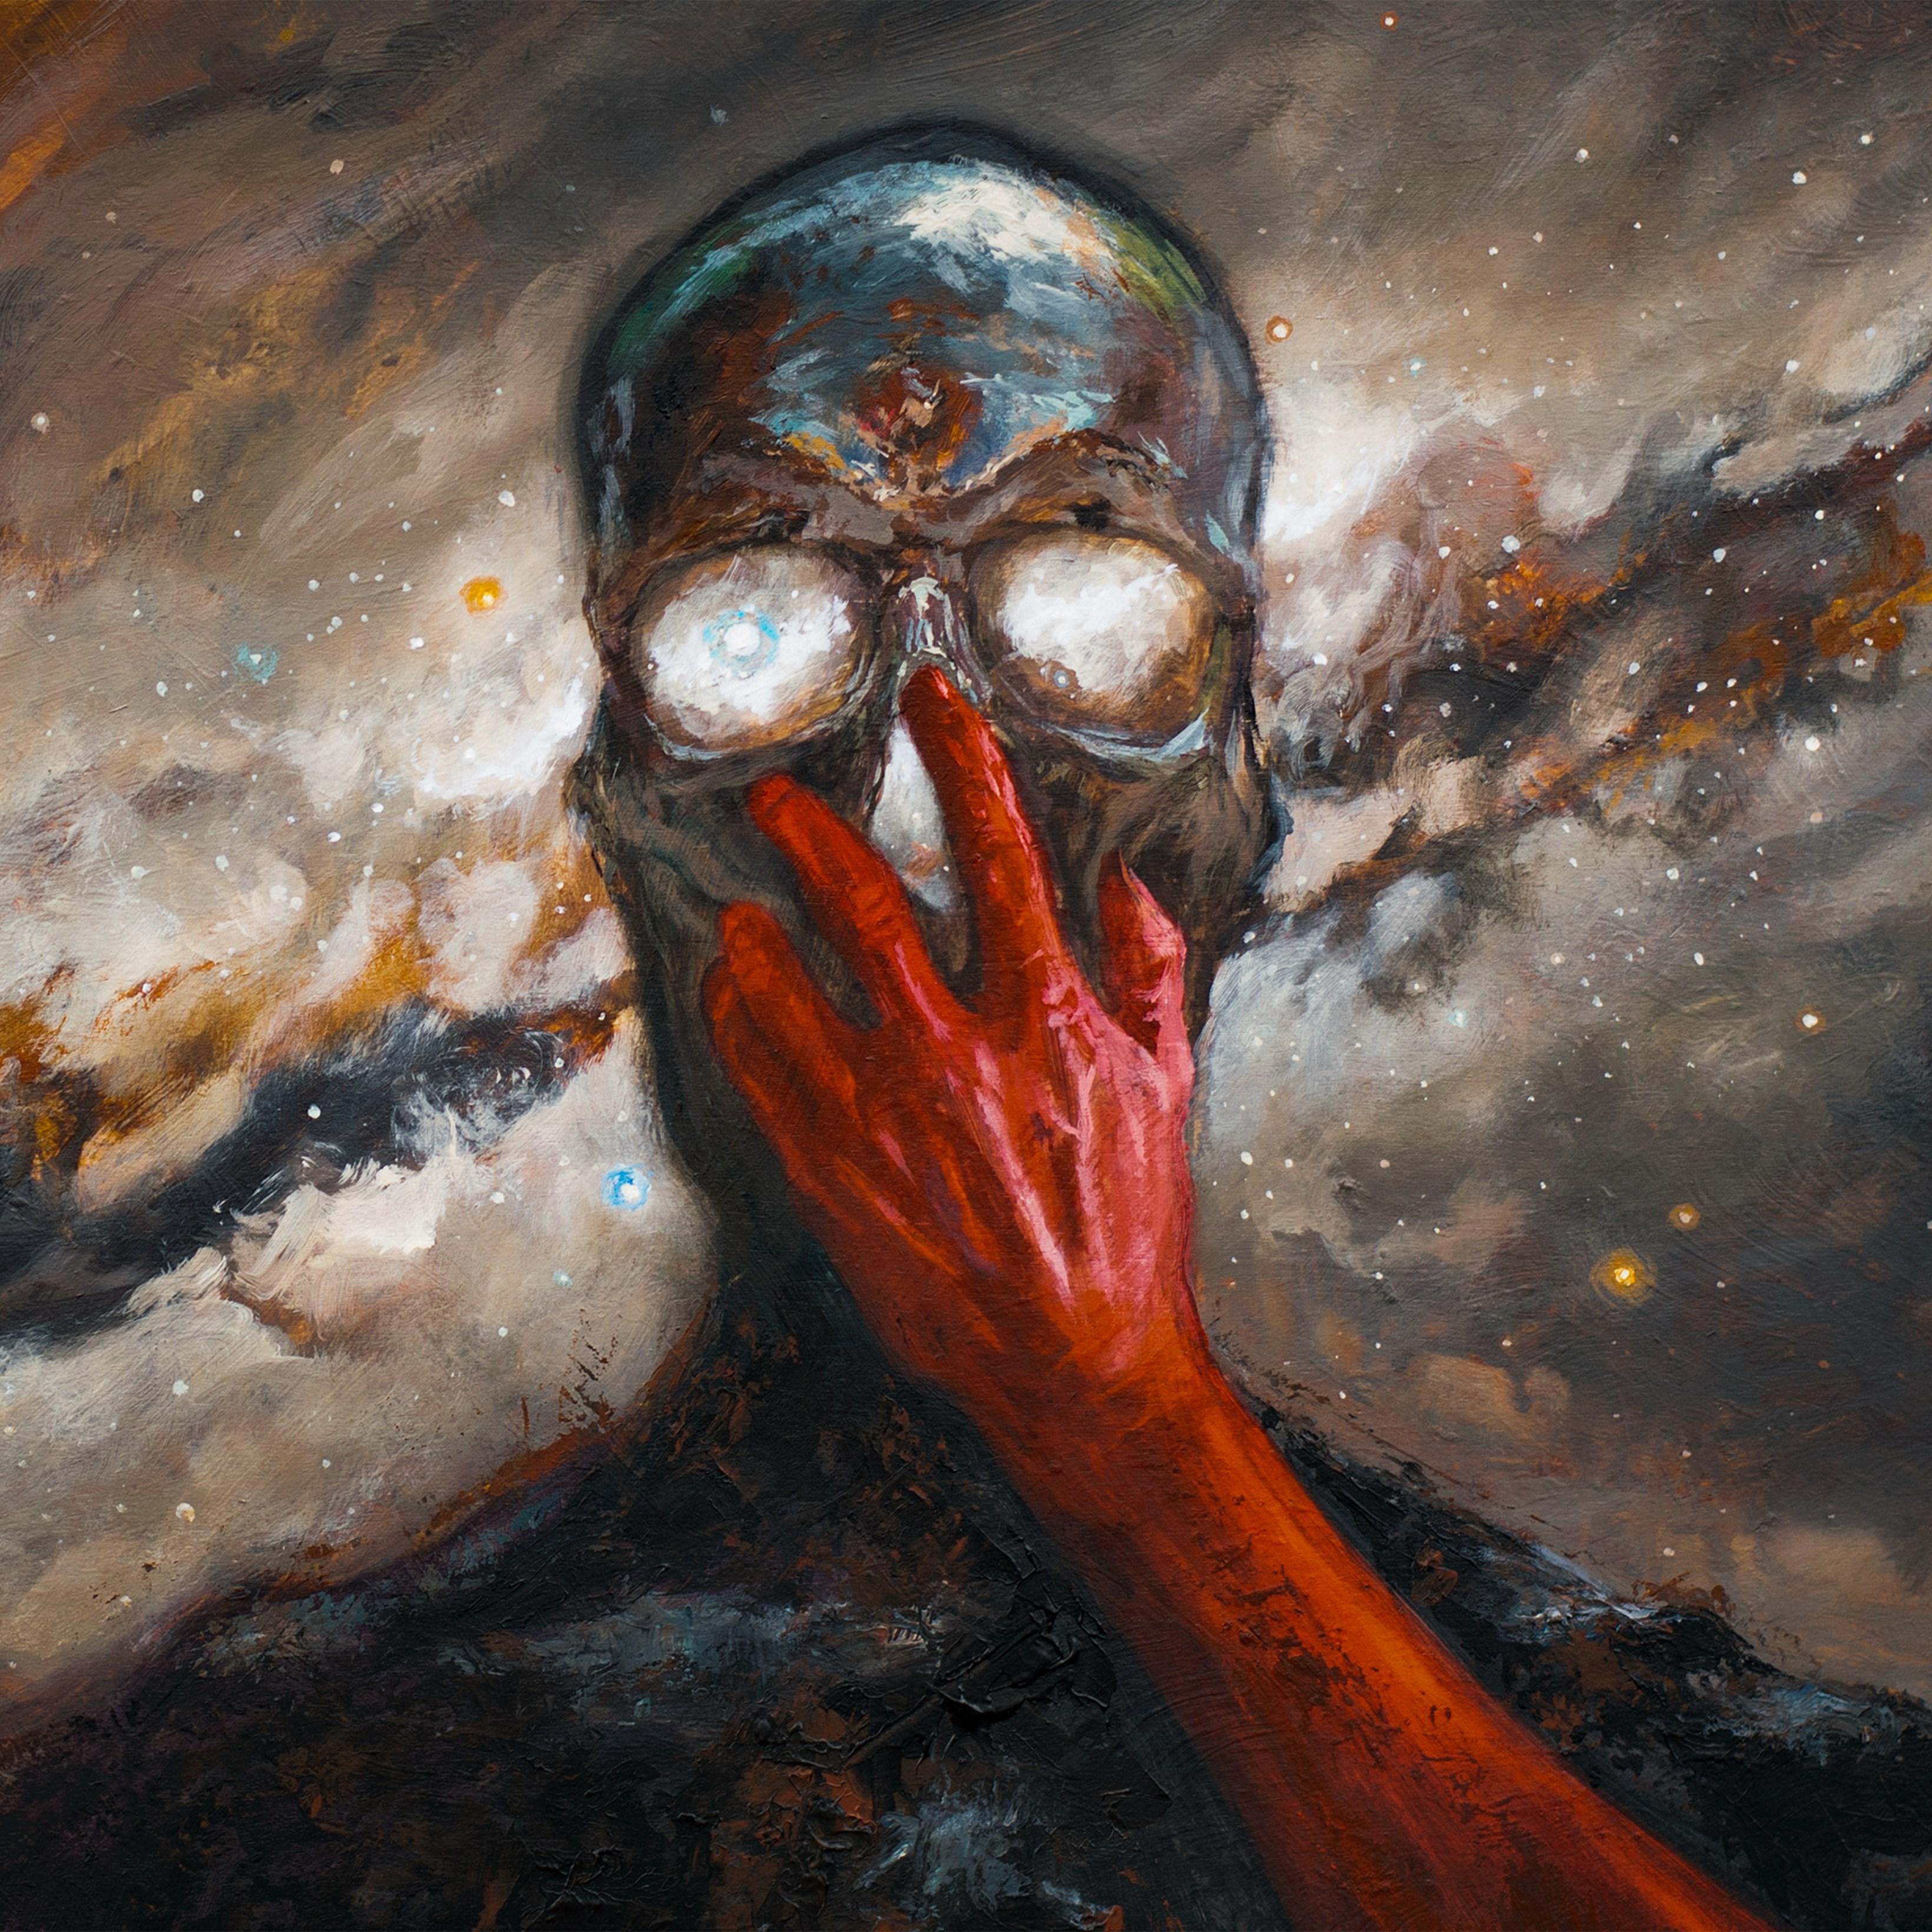 Bury Tomorrow - Cannibal - CD & Satan's Hollow, Manchester Event Entry - 1